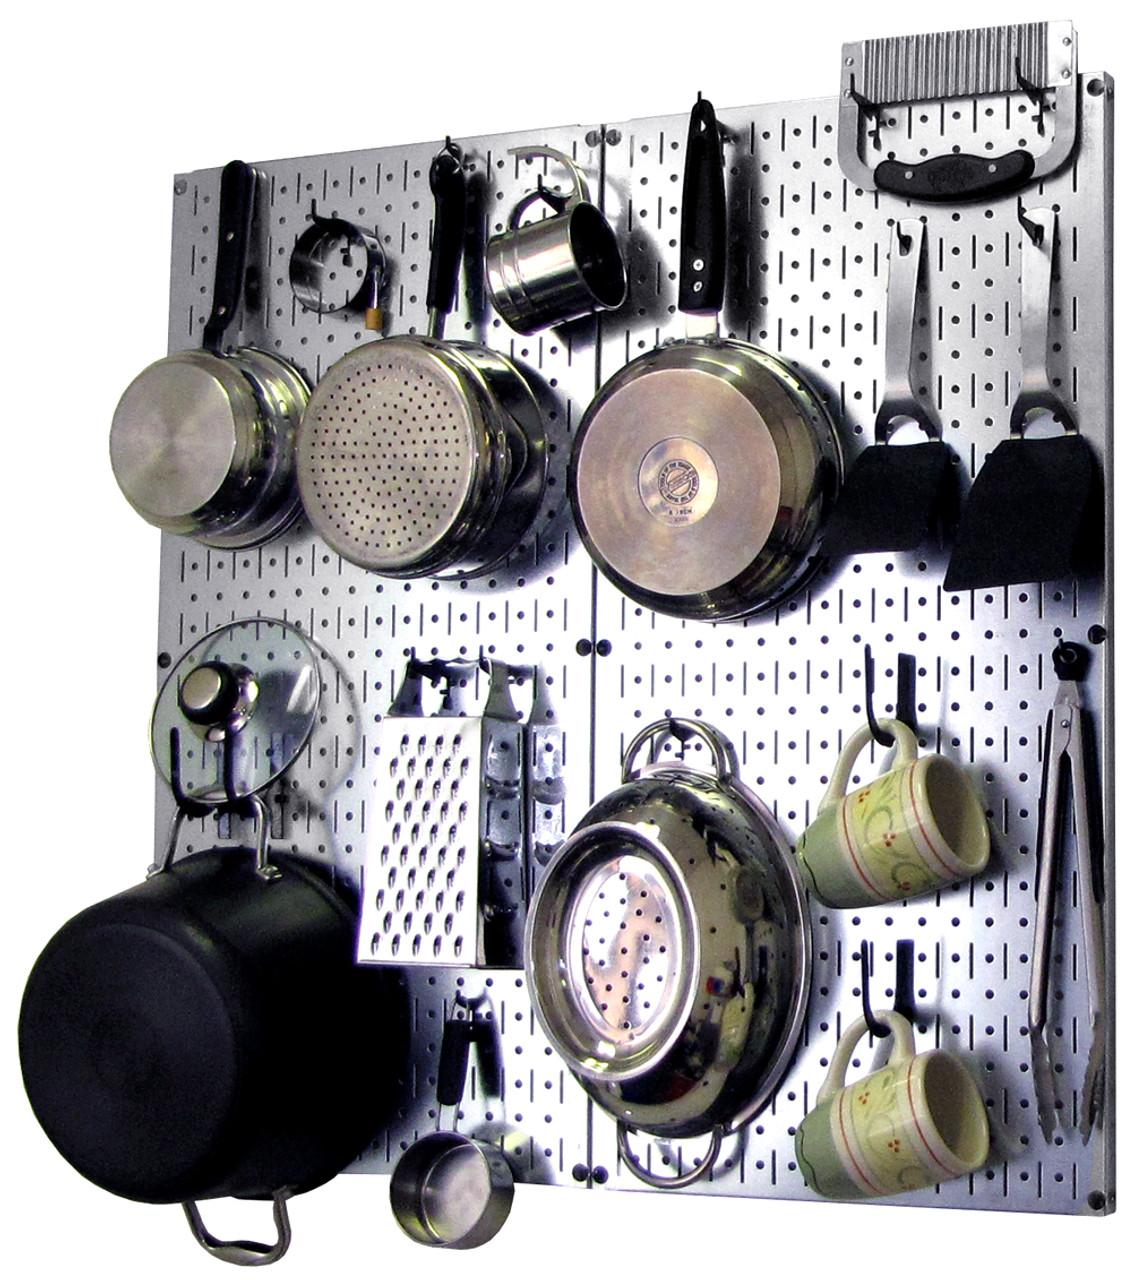 pegboard kitchen solid wood cabinets steel organizer metallic hanging pot rack wall